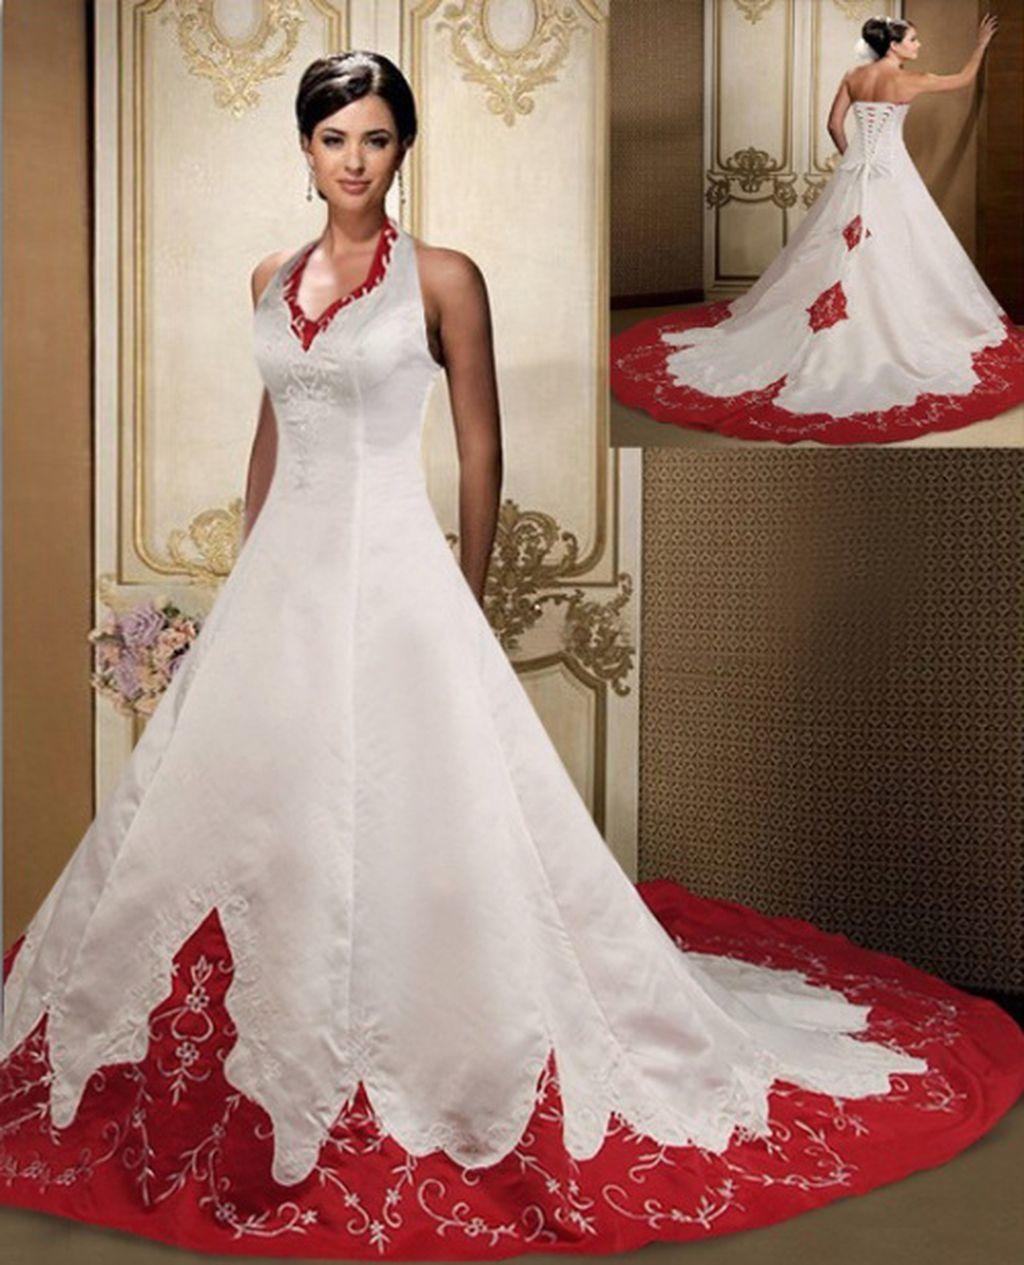 Awesome elegant christmas wedding dress ideas to makes you look